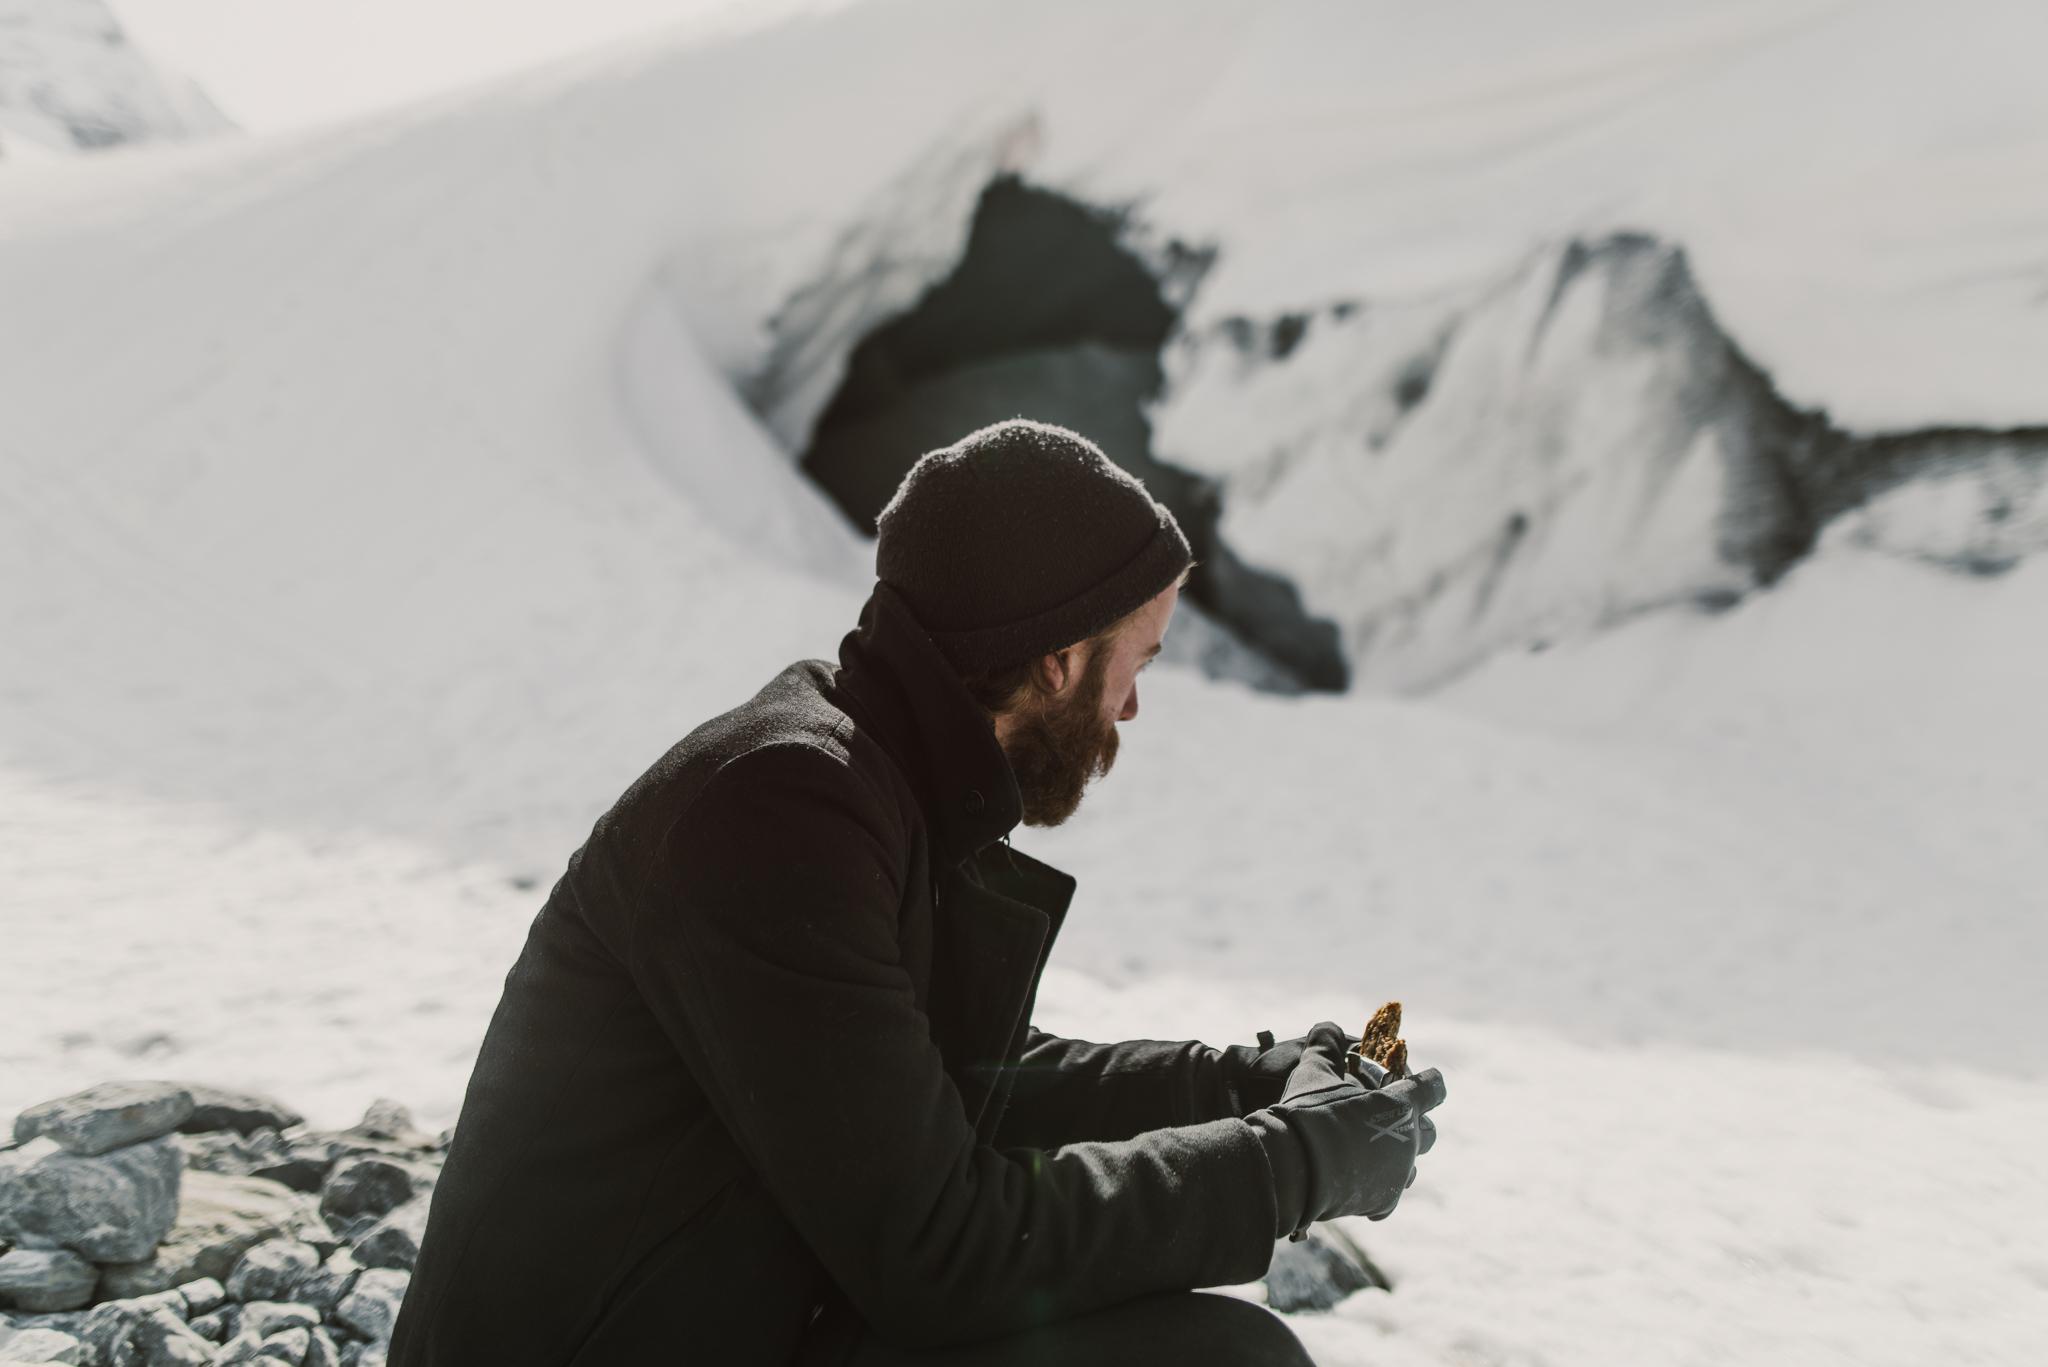 ©The-Ryans-Photo---Athabasca-Glacier,-Ice-Cave-024.jpg